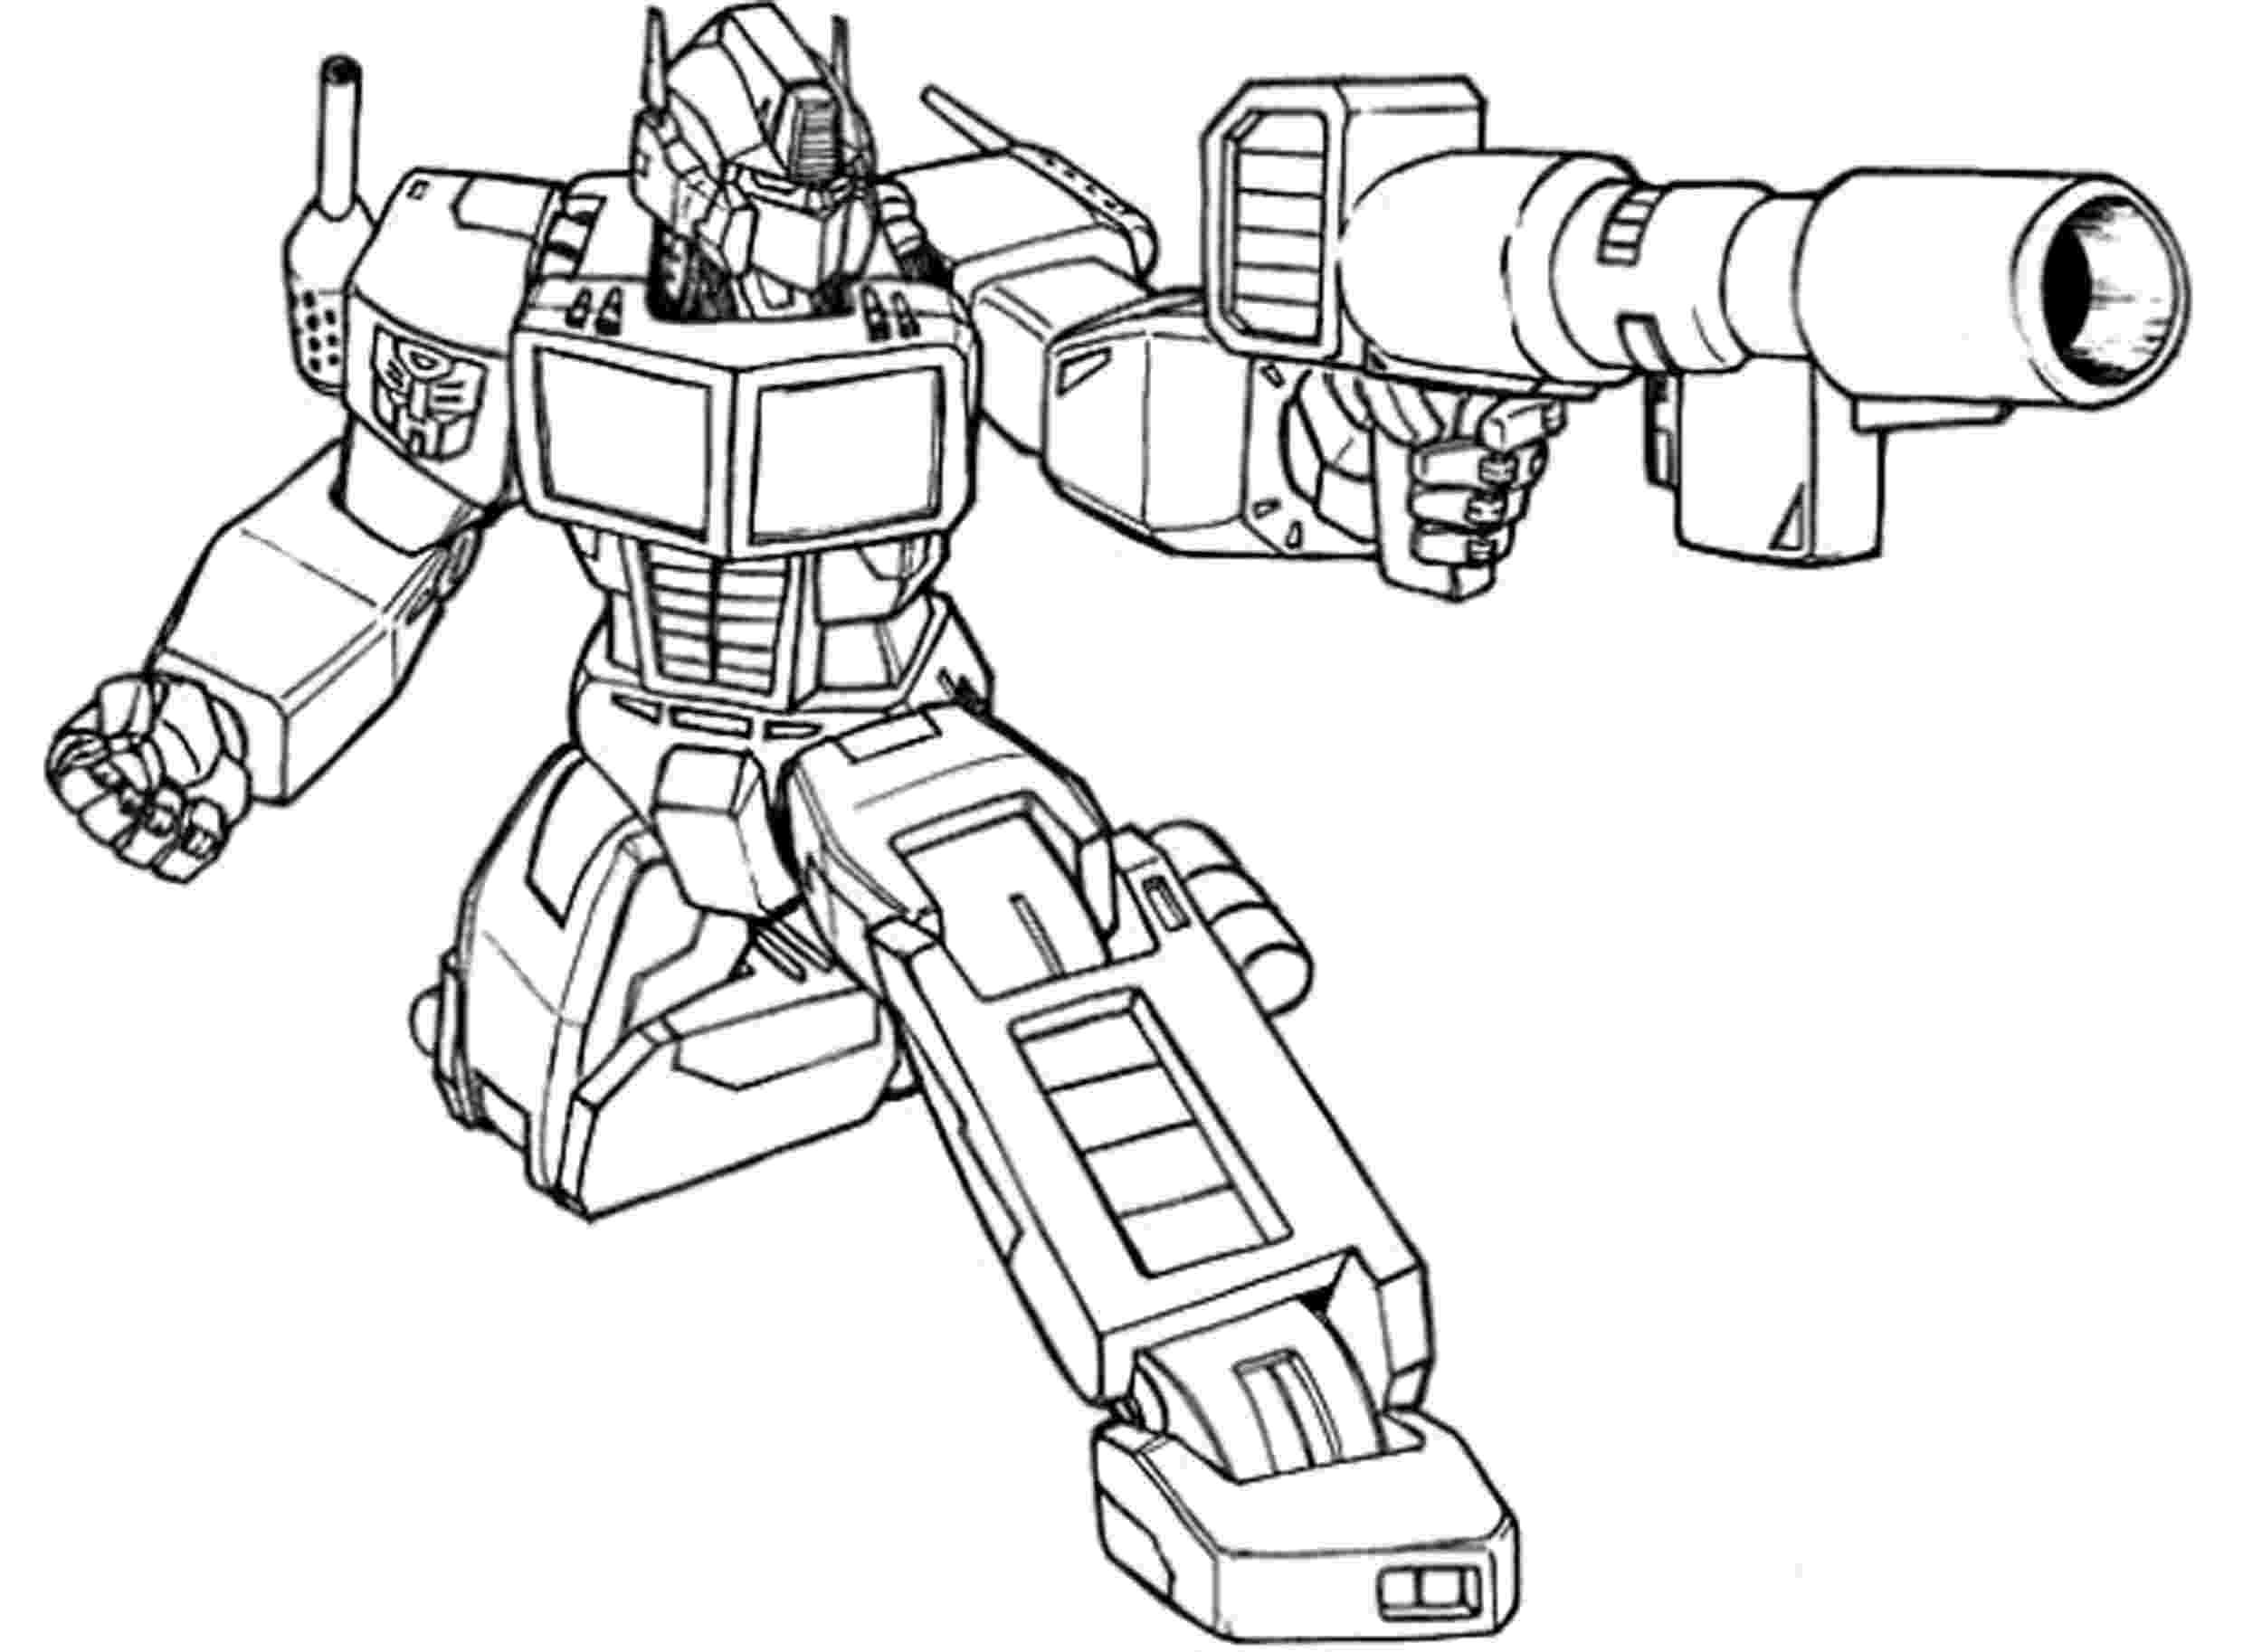 transformers coloring free printable transformers coloring pages for kids transformers coloring 1 1